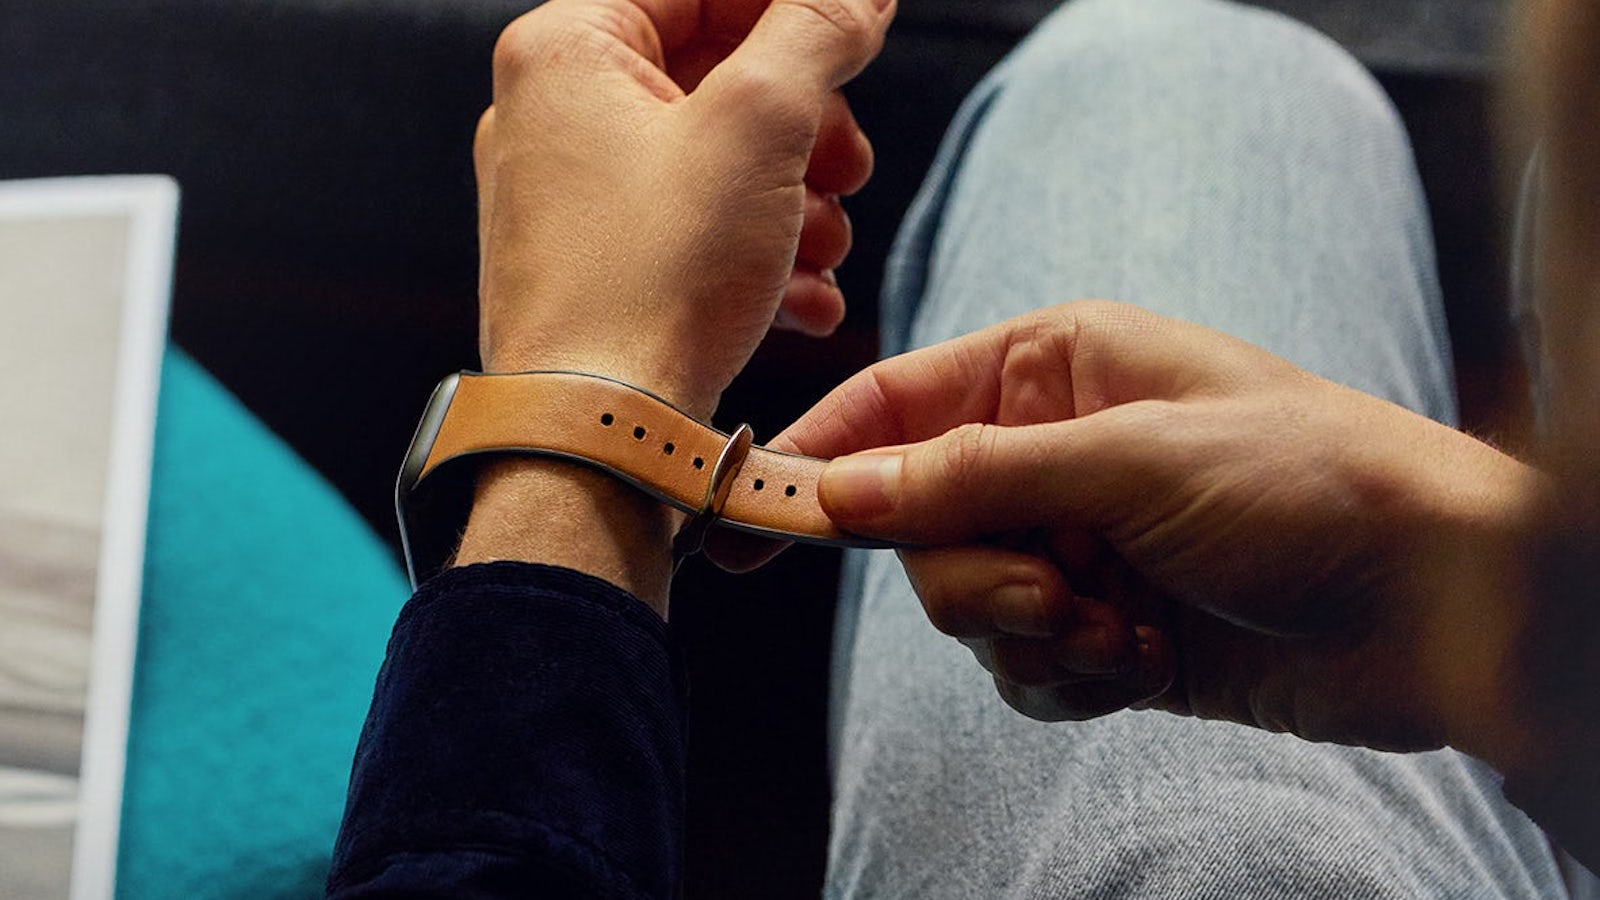 Bellroy-Watch-Strap-for-Apple-Watch-01.jpg